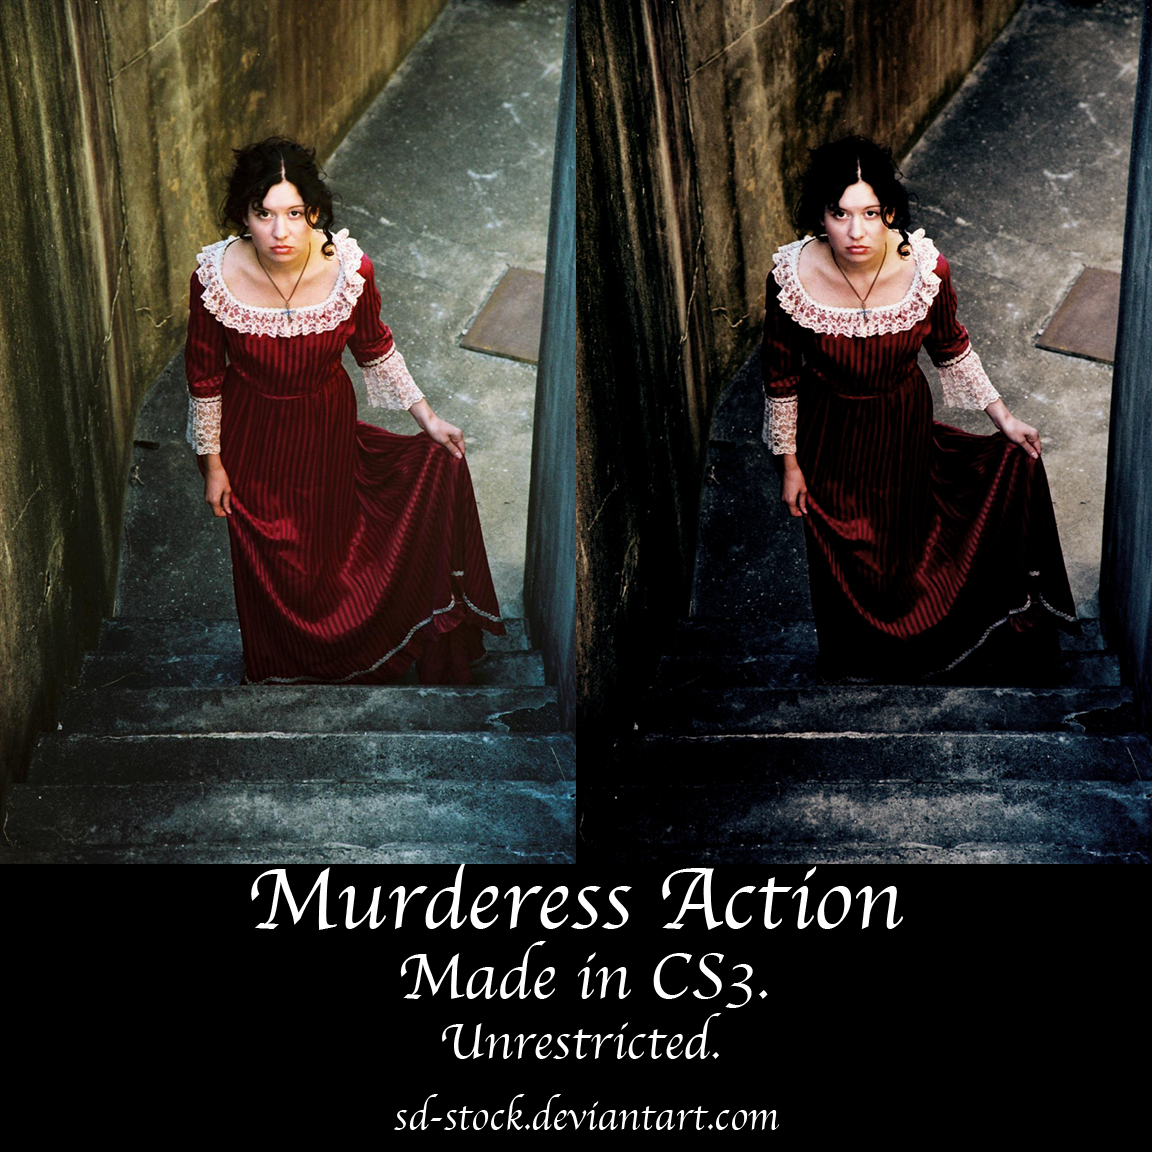 Murderess Action